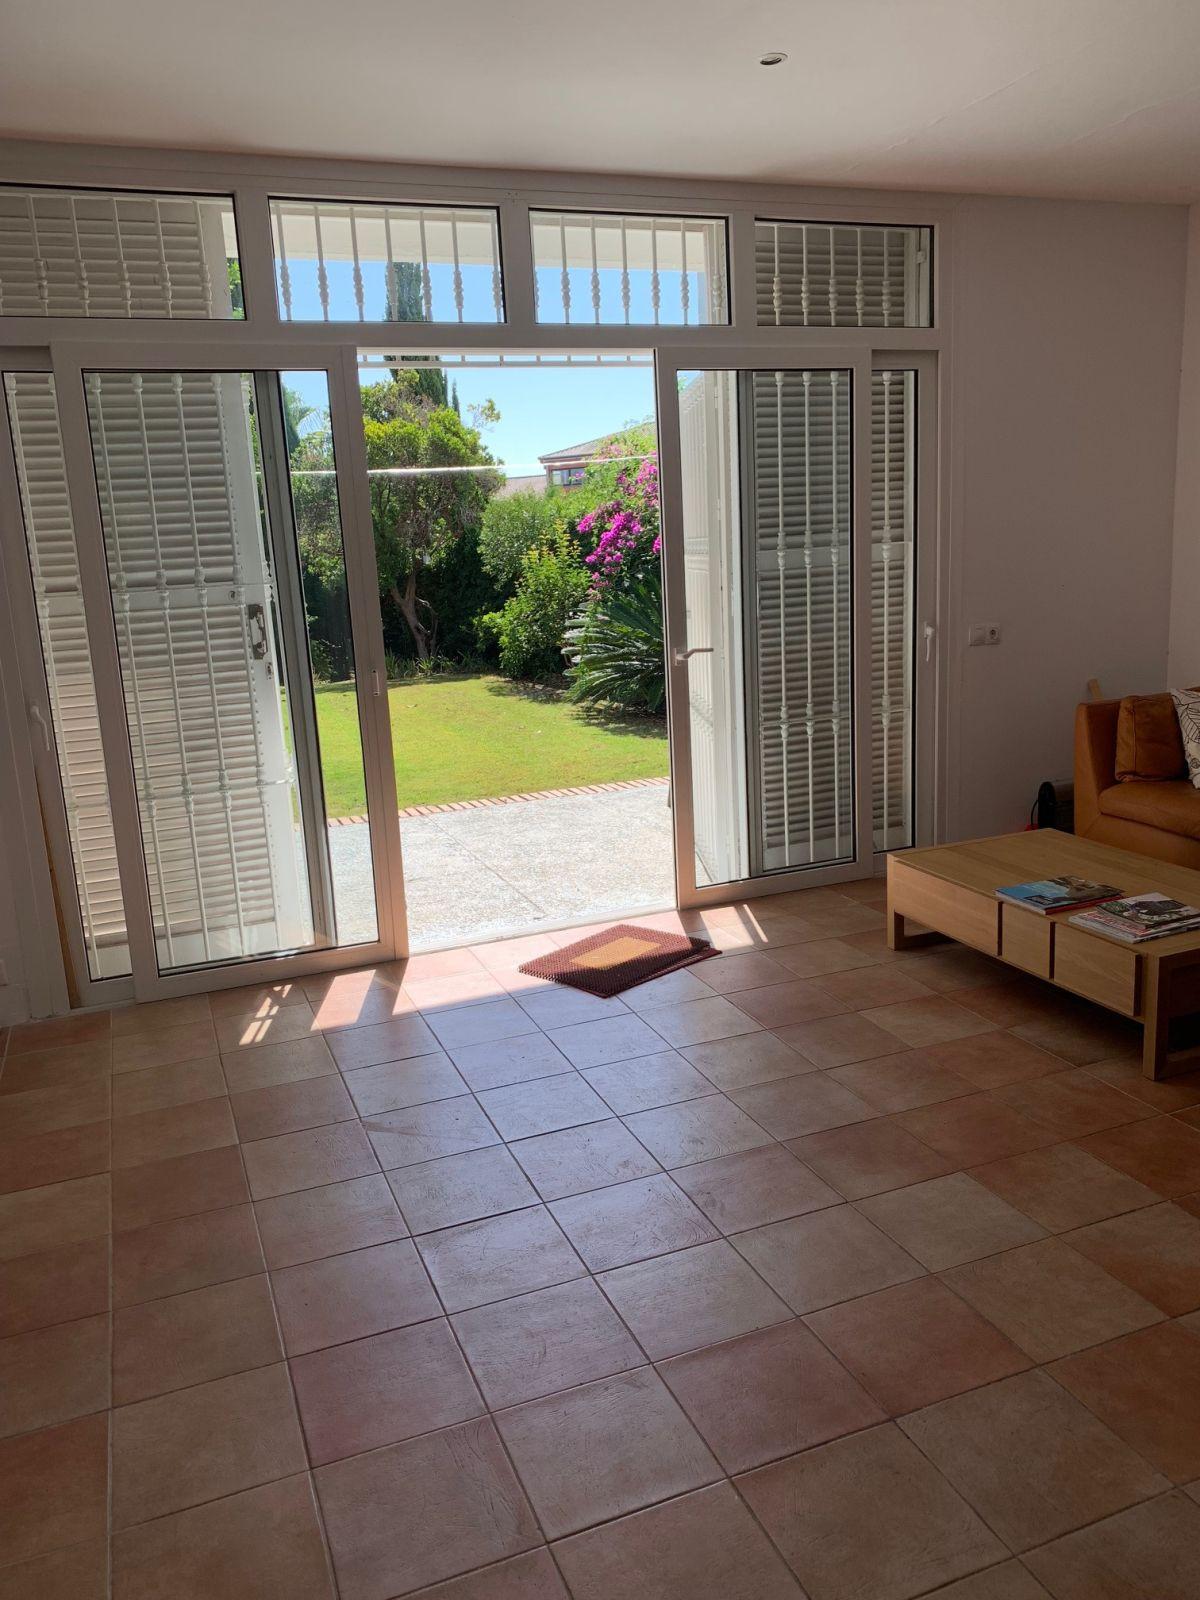 2 Bedroom Apartment For Sale, Sotogrande